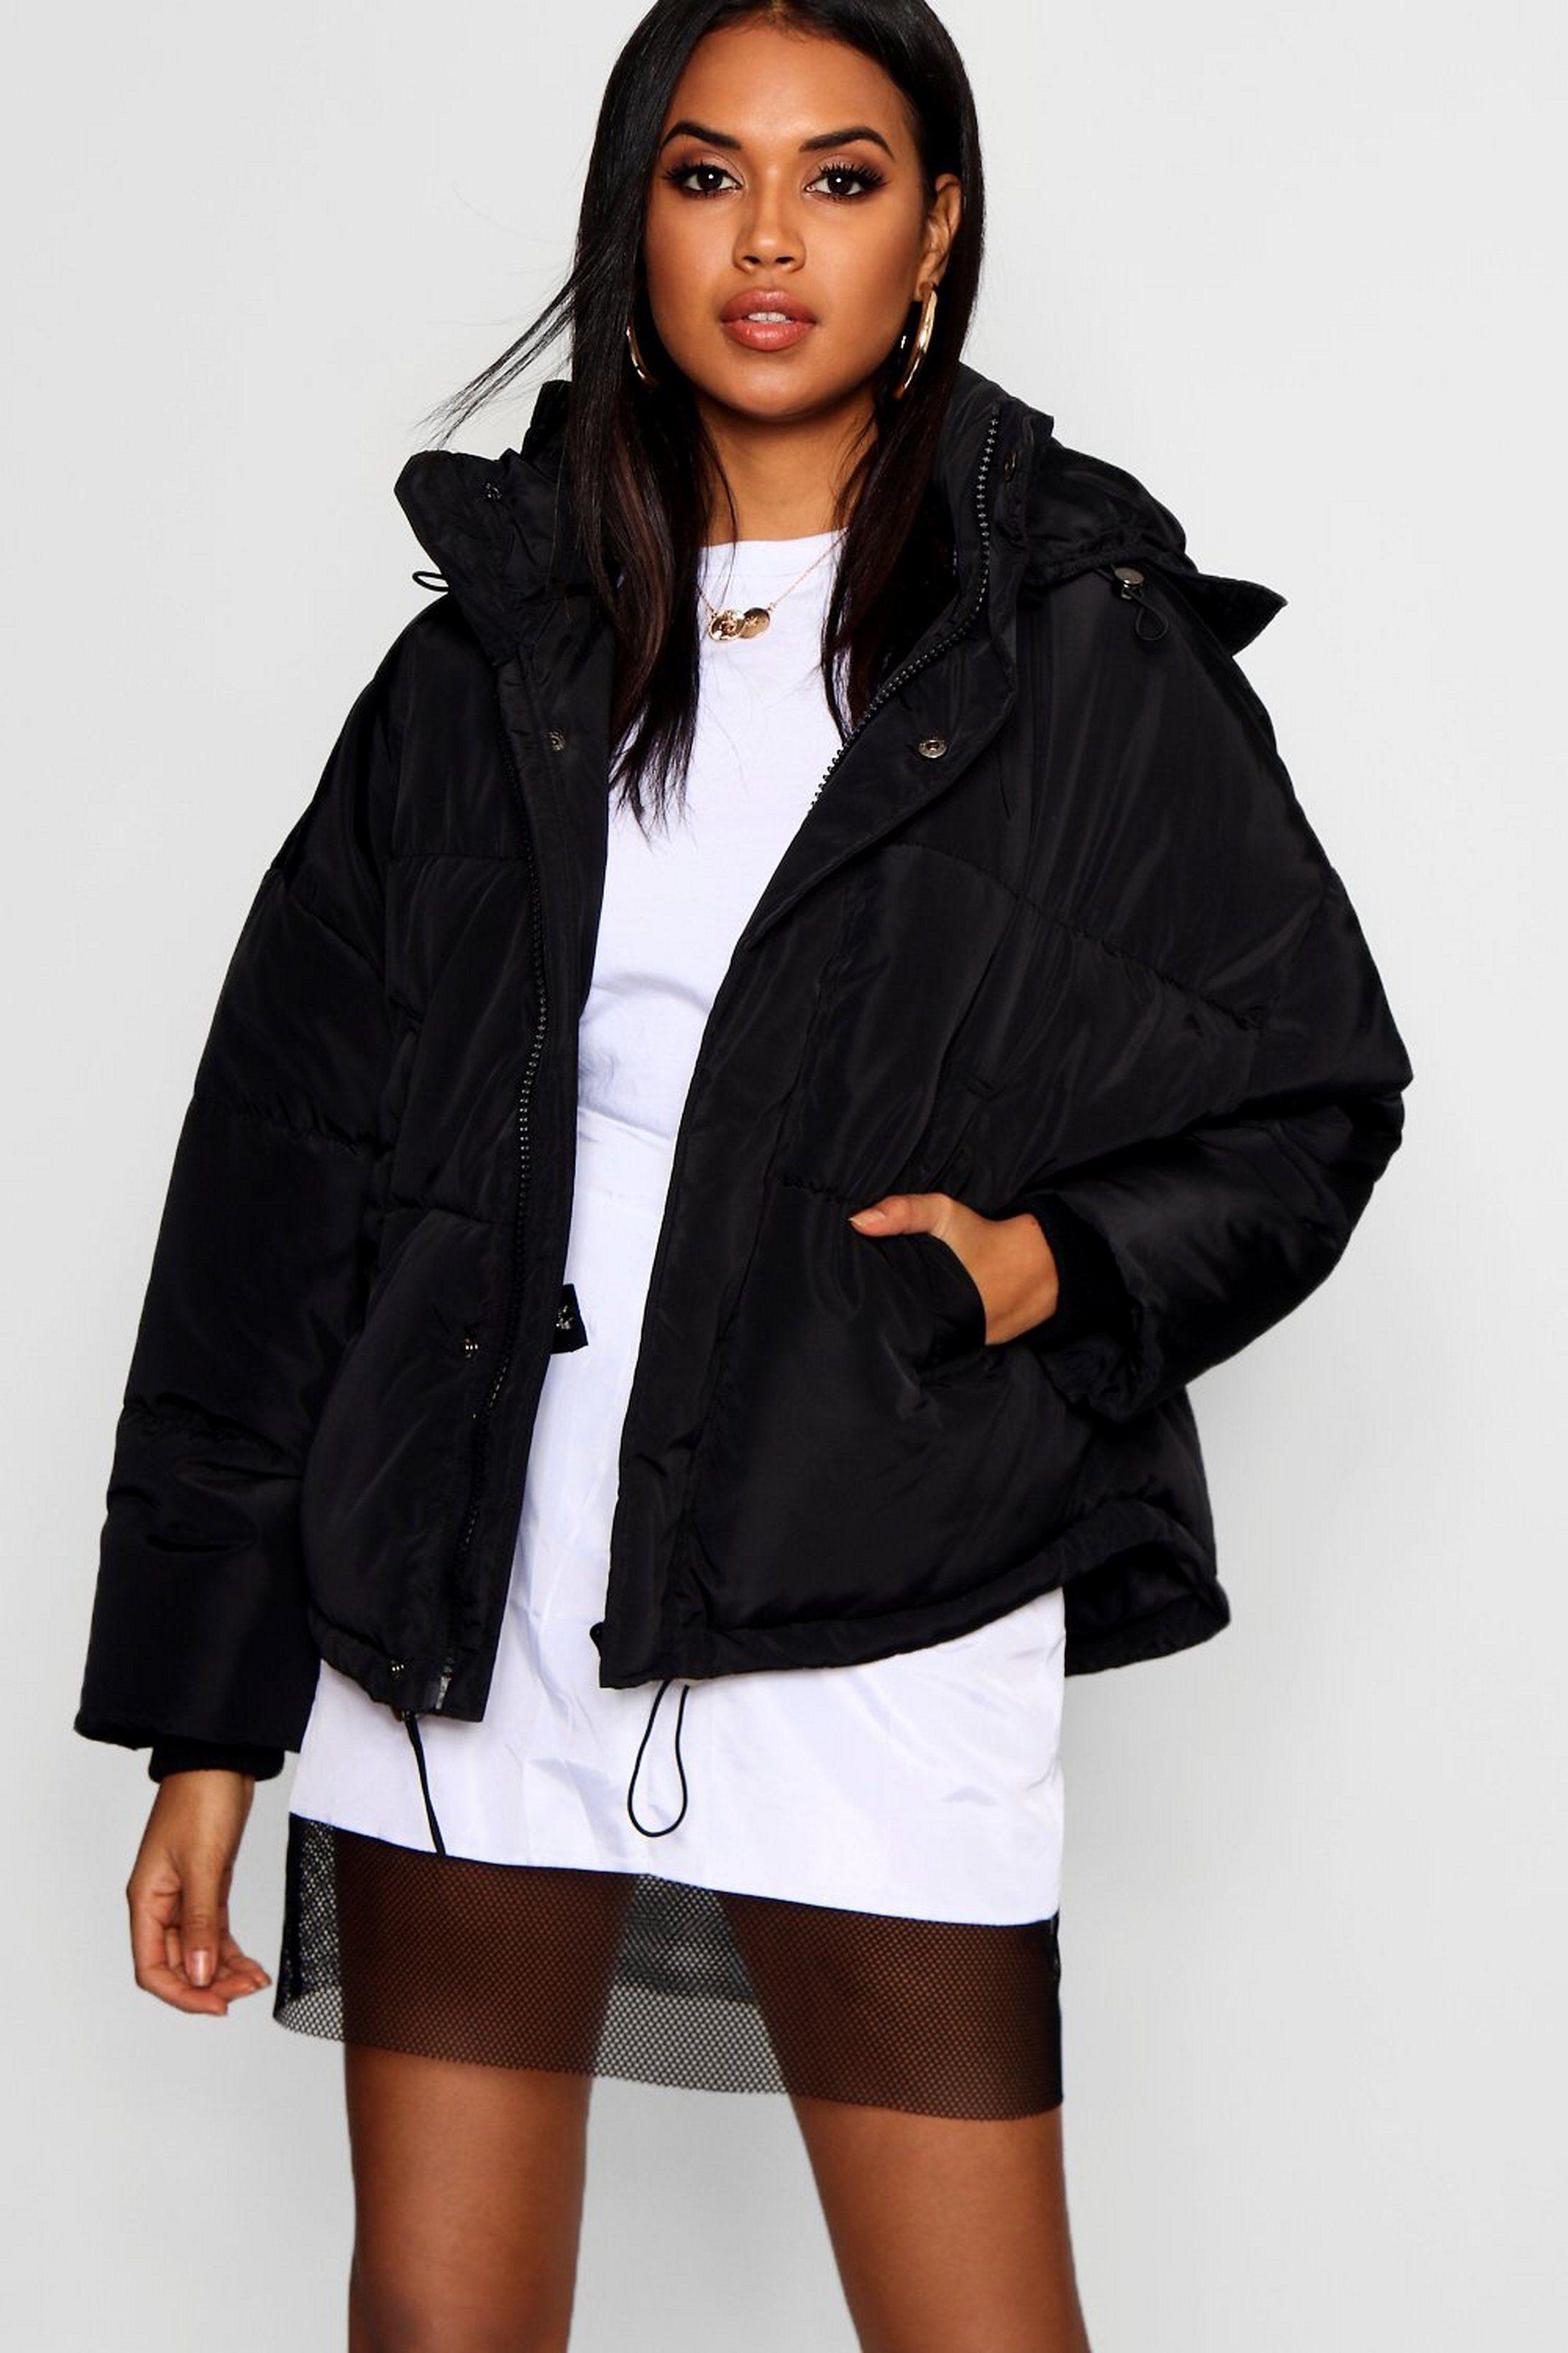 Oversized Hooded Puffer Jacket Boohoo Puffer Jacket Black Puffer Jacket Women Puffer Jackets [ 3272 x 2181 Pixel ]